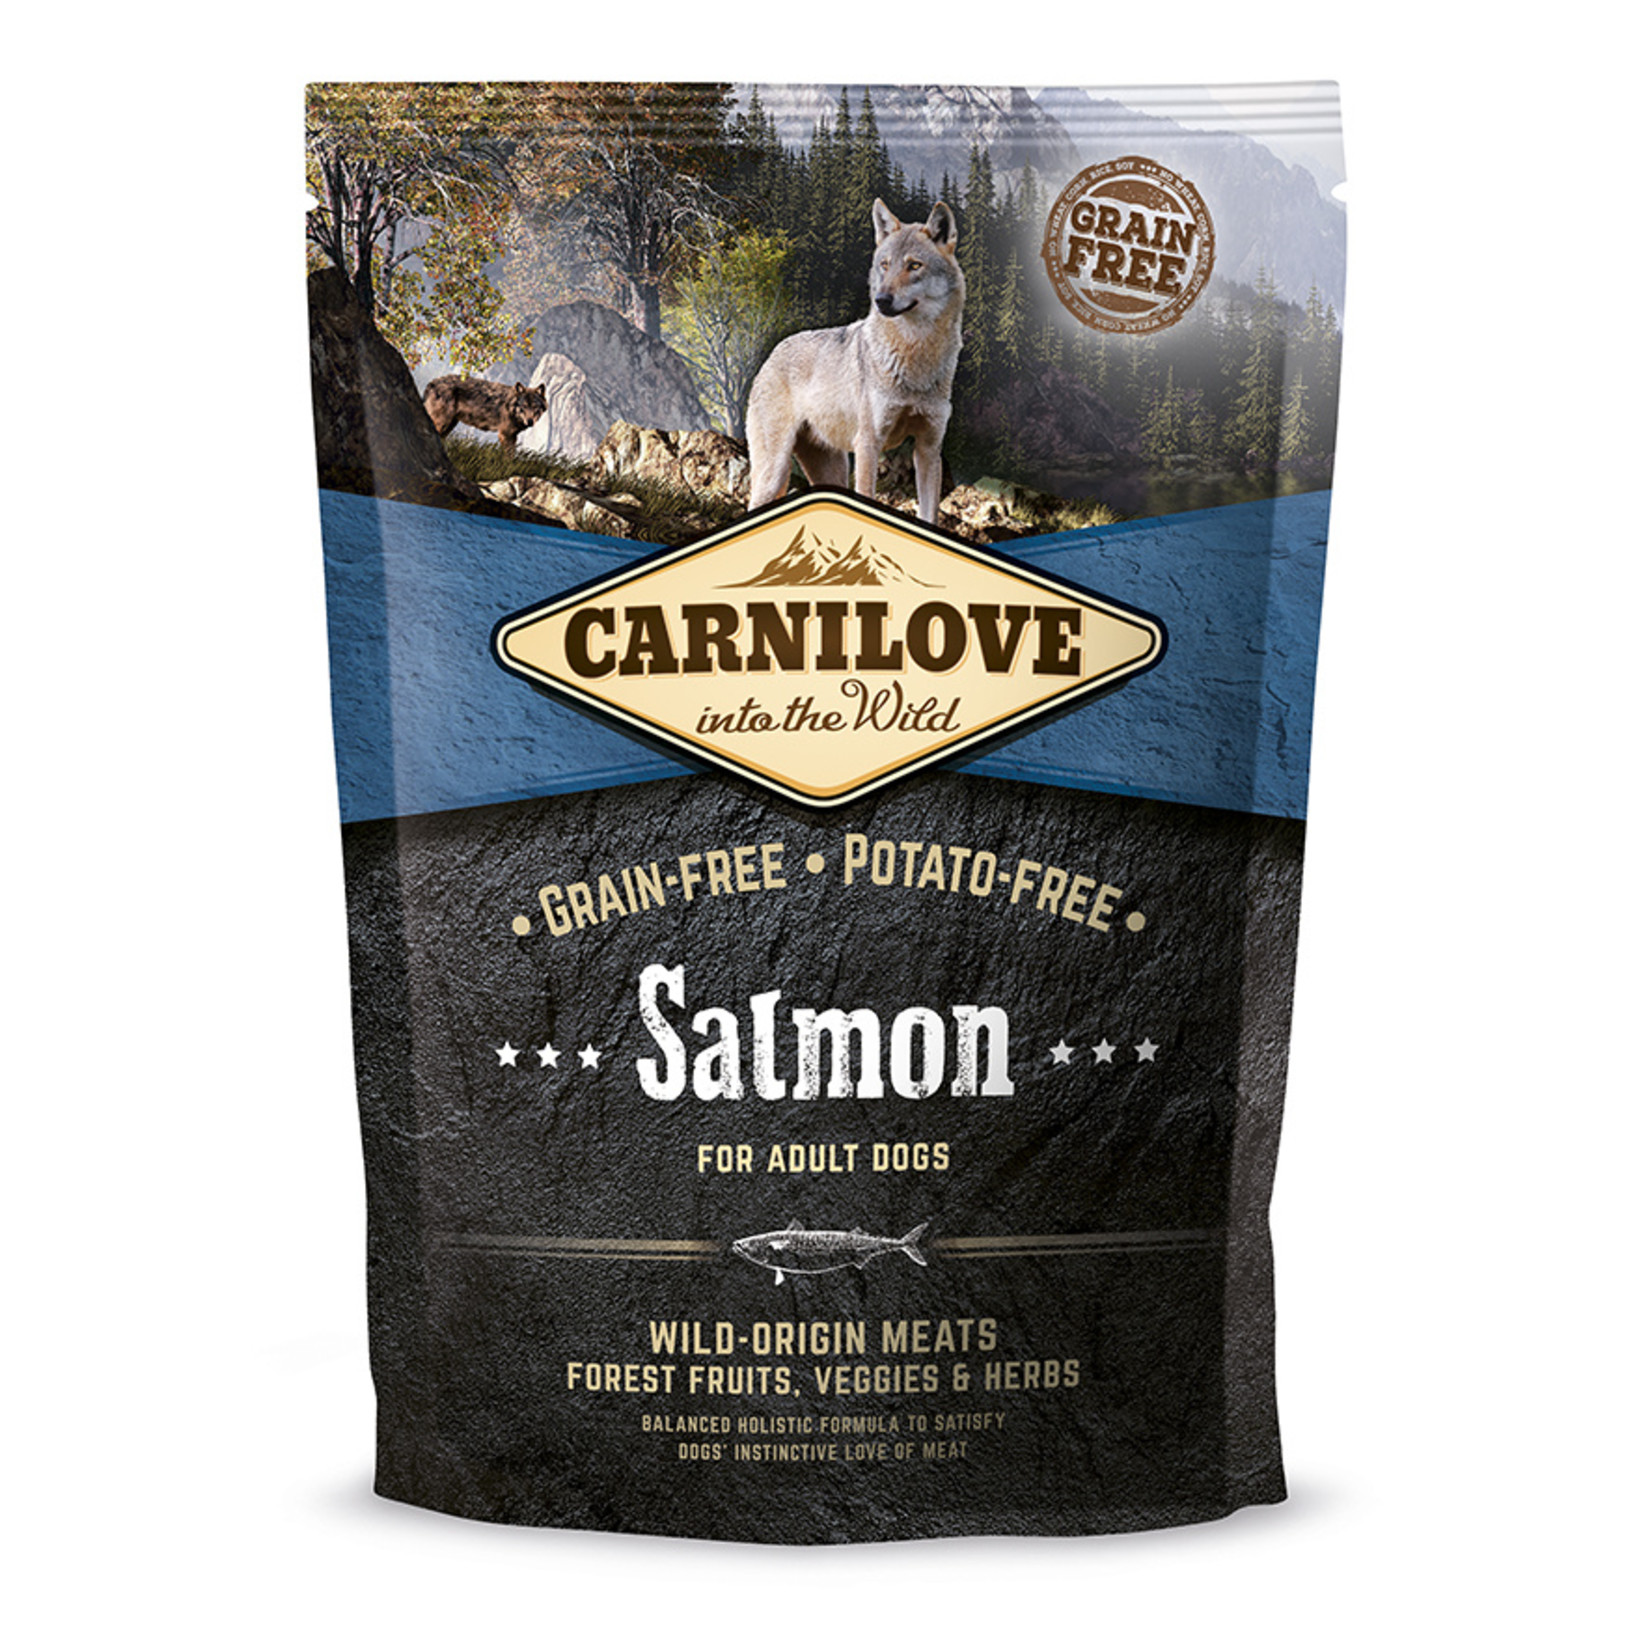 Carnilove Salmon adult